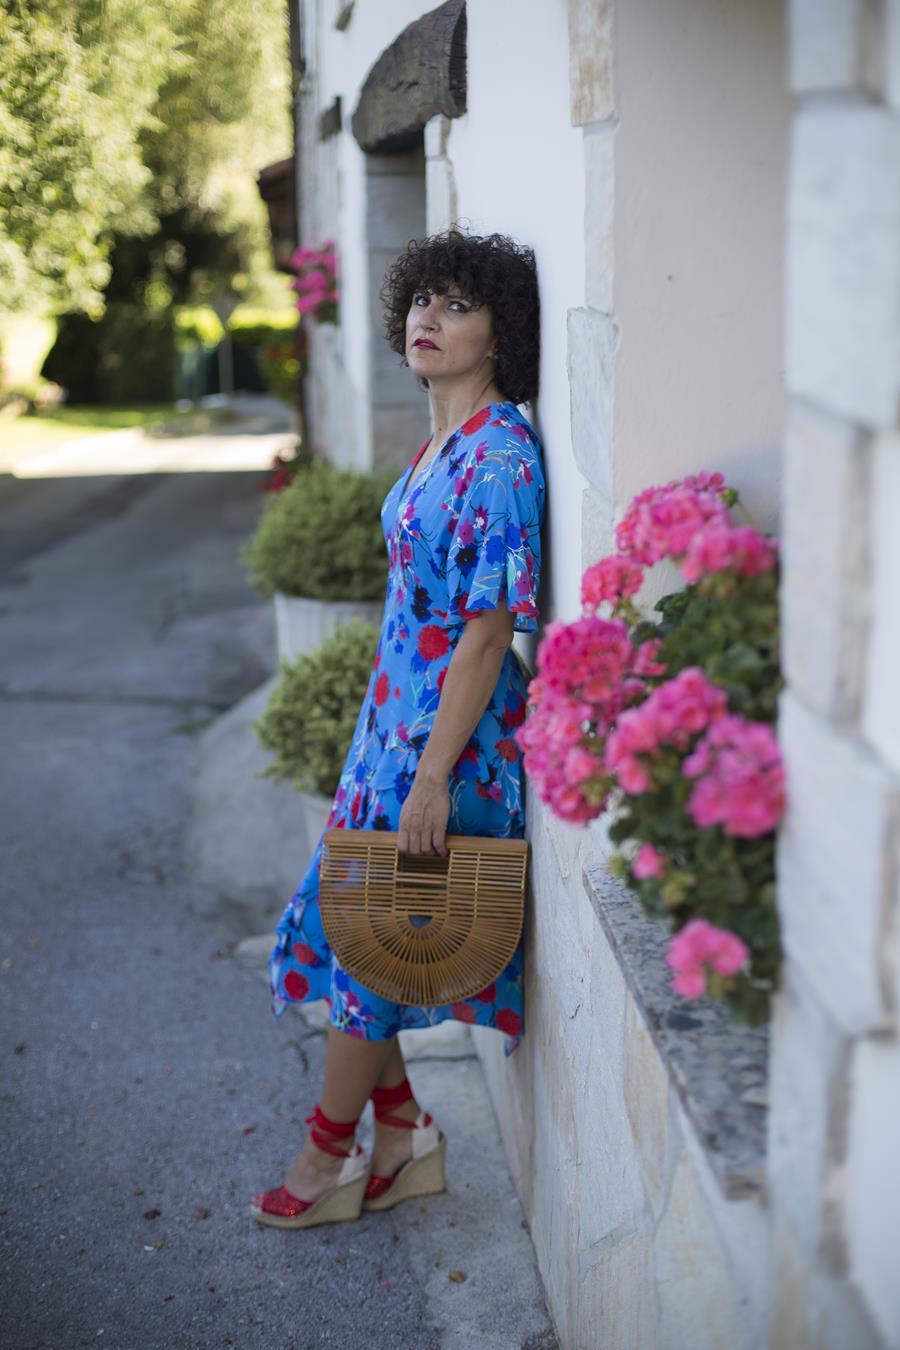 Rebeca Valdivia, asesora de imagen, personal shopper, estilista, stilist, Donostia, San Sebastián, Miss Clov, dress, flower dress, vestido de flores, alpargatas, espadrilles, ecológico, hecho a mano, handmade, artesano, made in spain, saray y sus alpargatas, bolso bambú, bamboo bag, curls